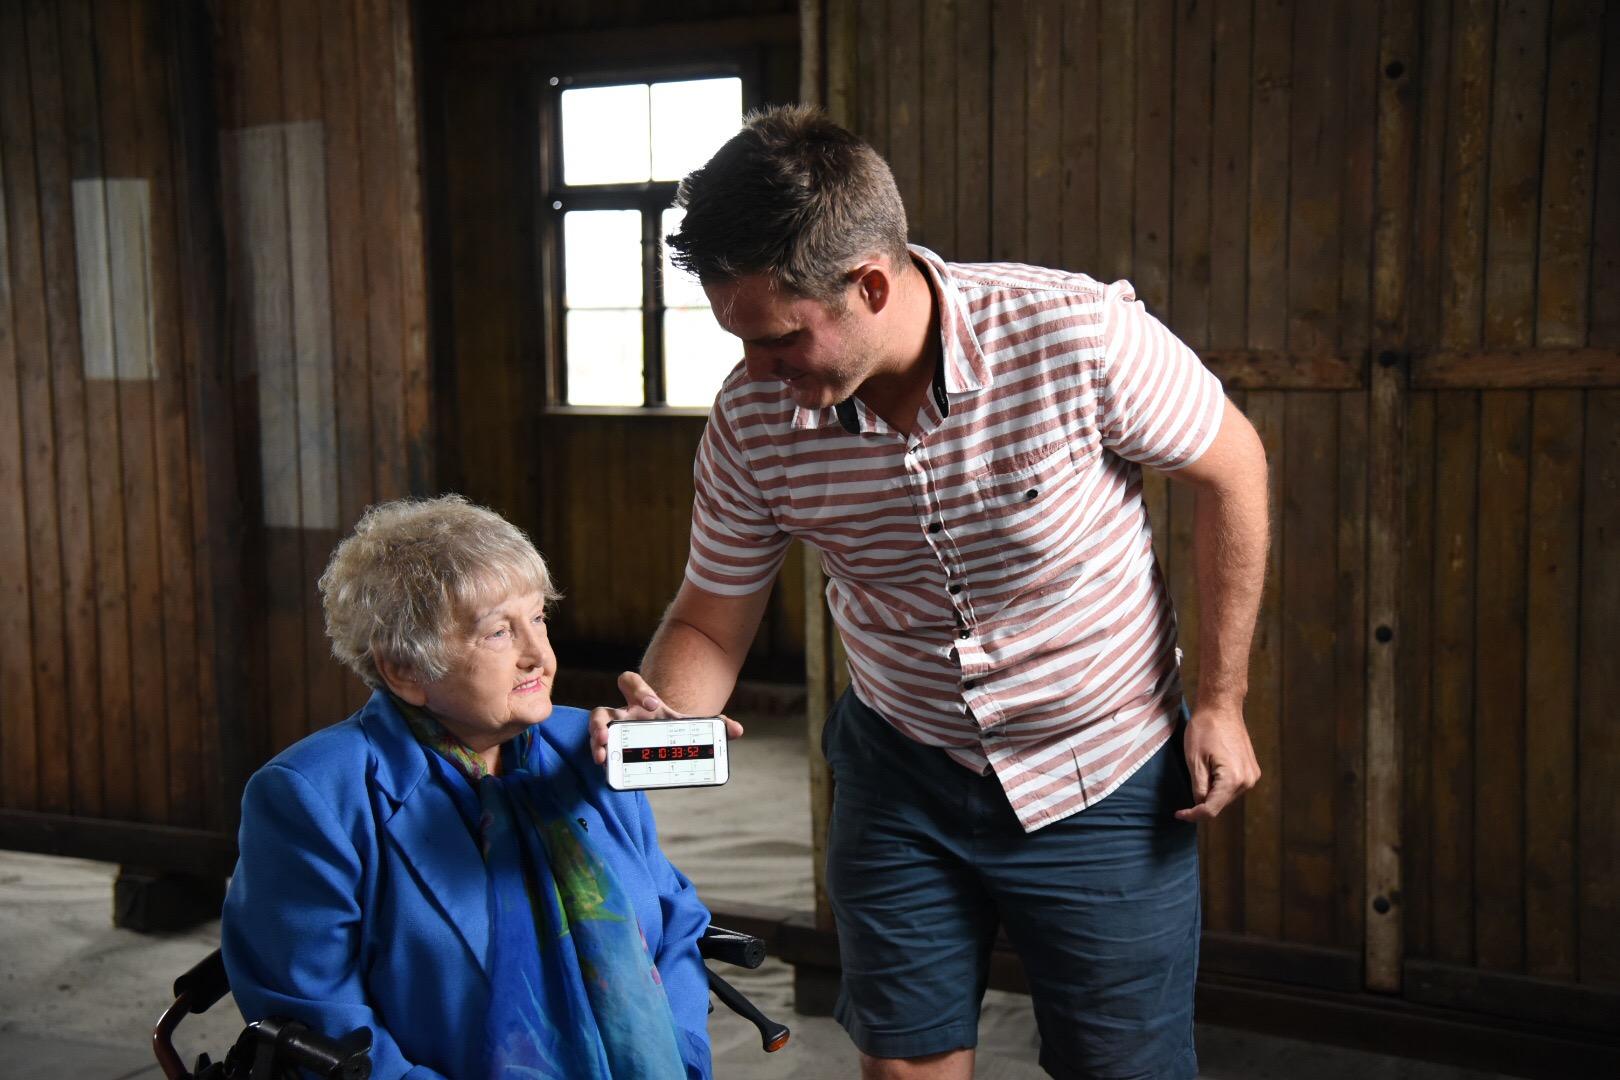 Behind the scenes, the film crew checks lighting on Eva Kor.